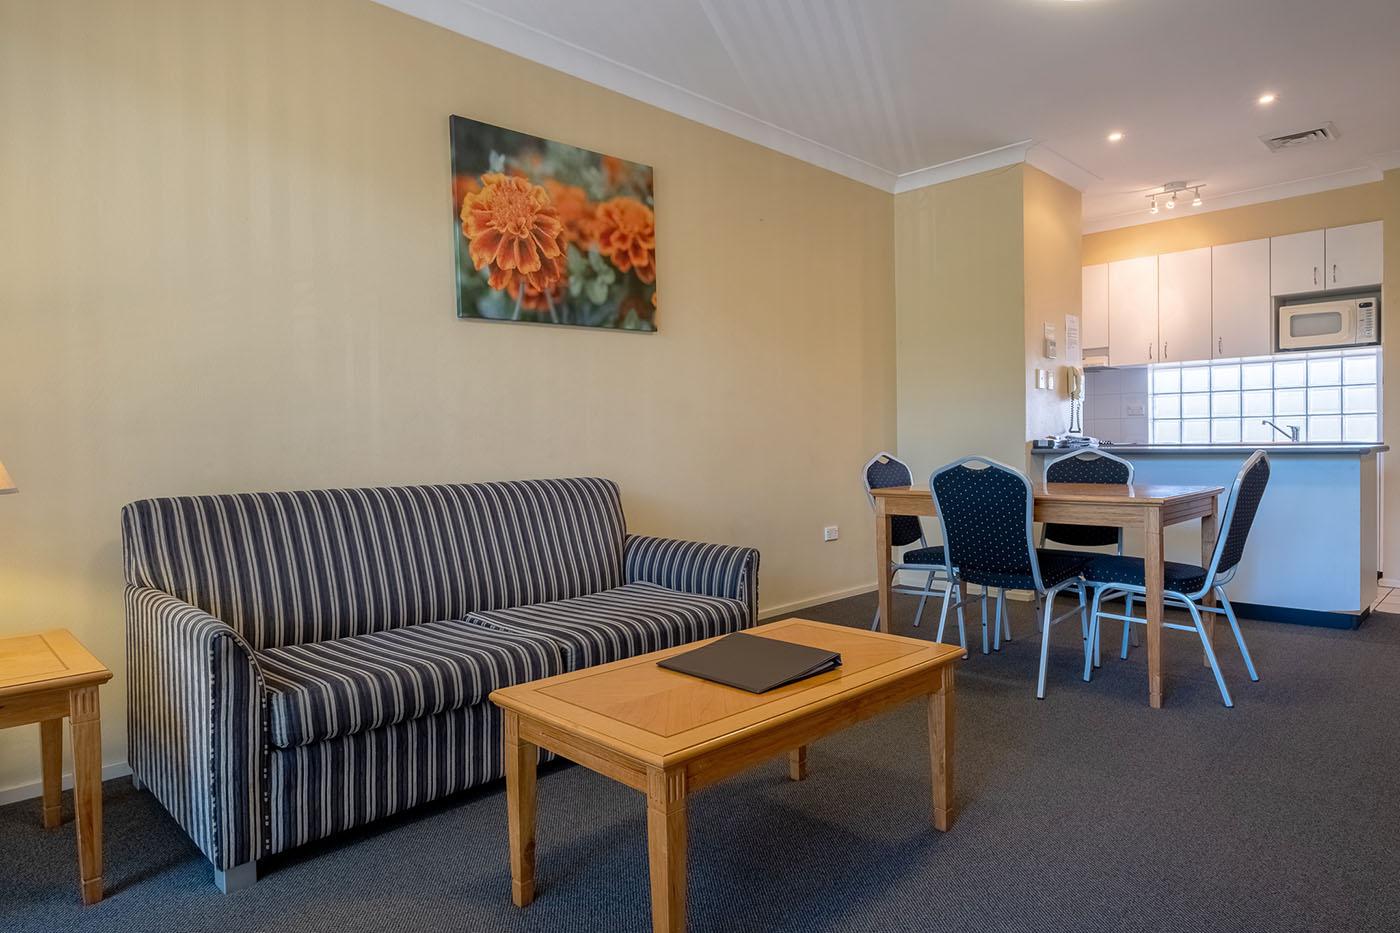 Maclin Lodge 2 Bedroom Apartment